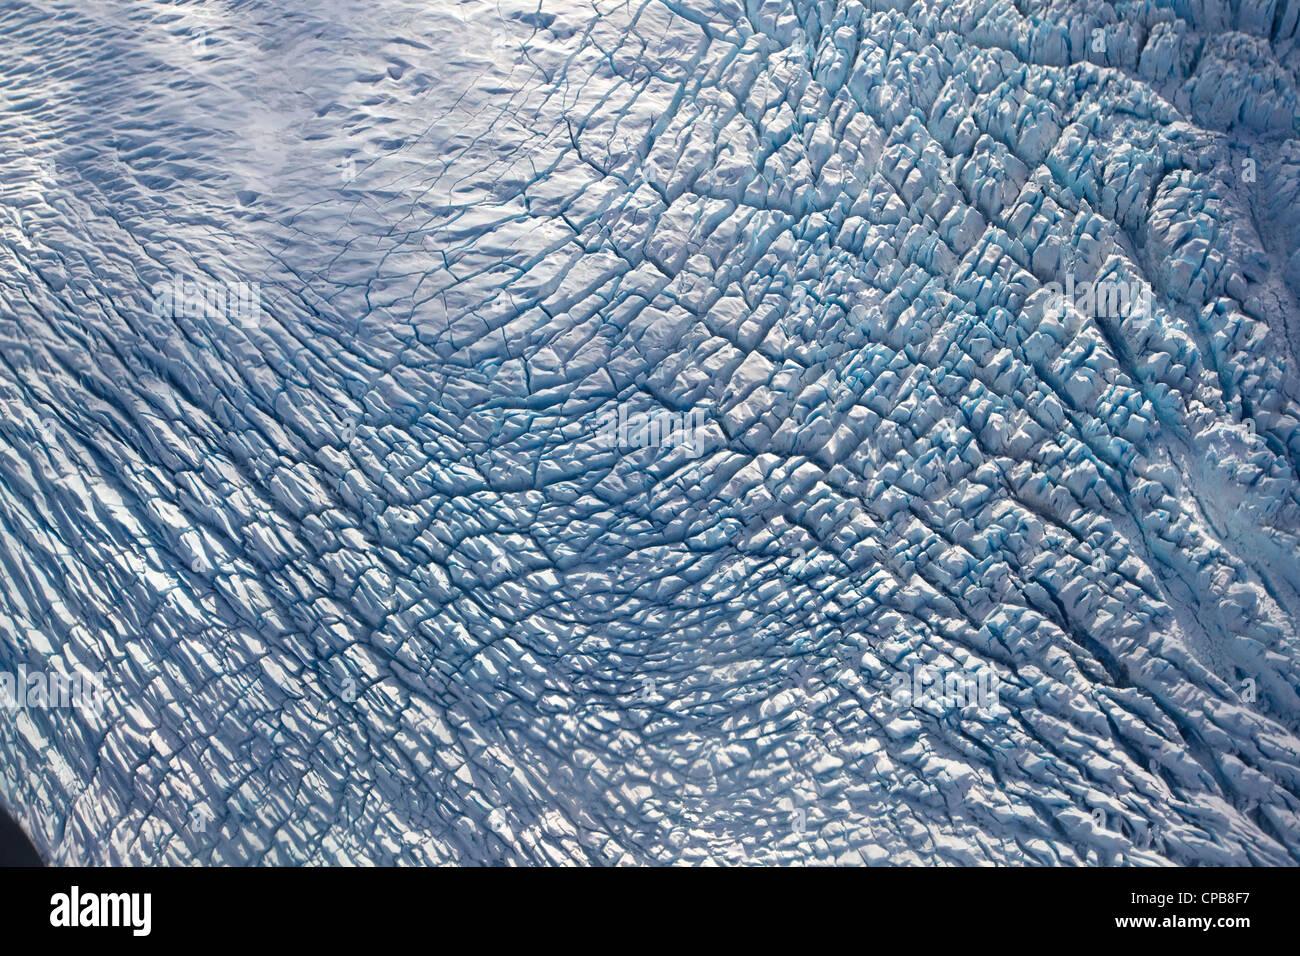 Knik Glacier ice in Chugach Mountains, Alaska, aerial photo - Stock Image